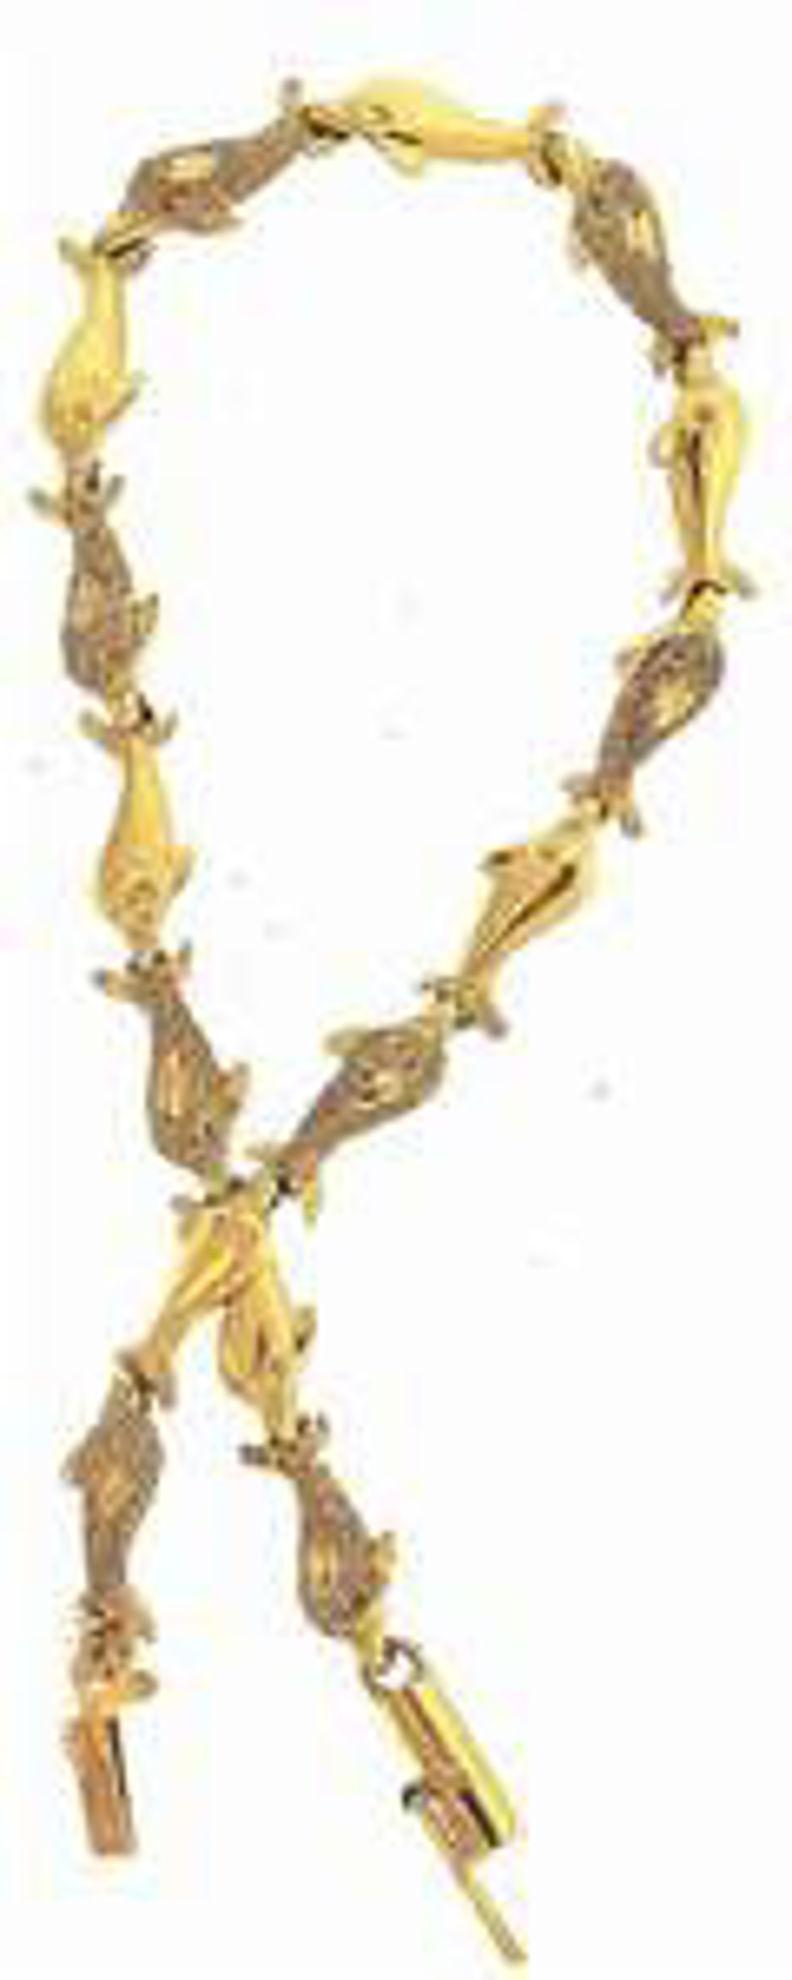 Picture of Bracelets 14kt-3.7 DWT, 5.8 Grams